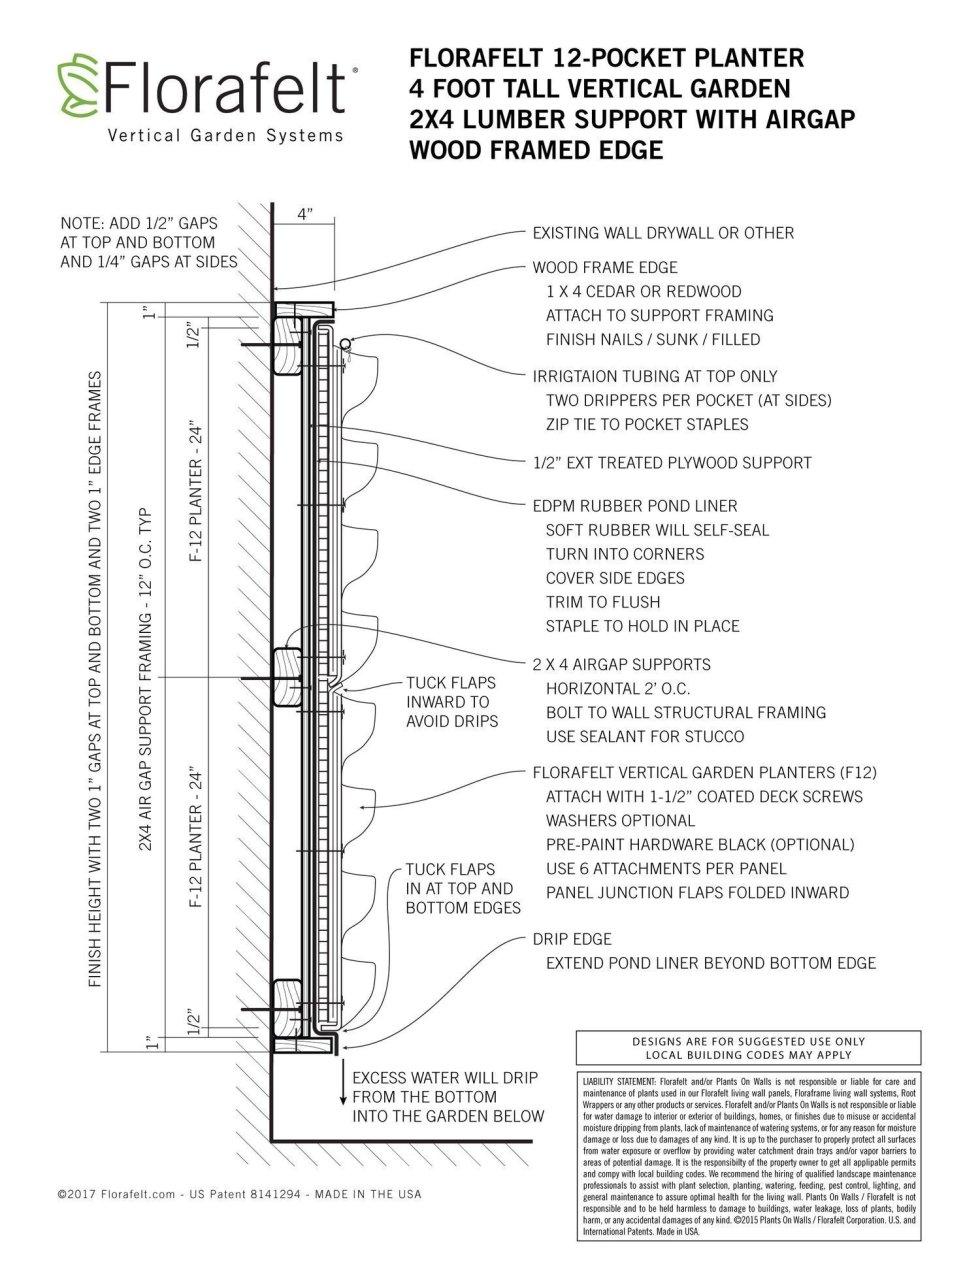 Florafelt 2x4 Lumber Support with Air Gap Wood Framed Edge